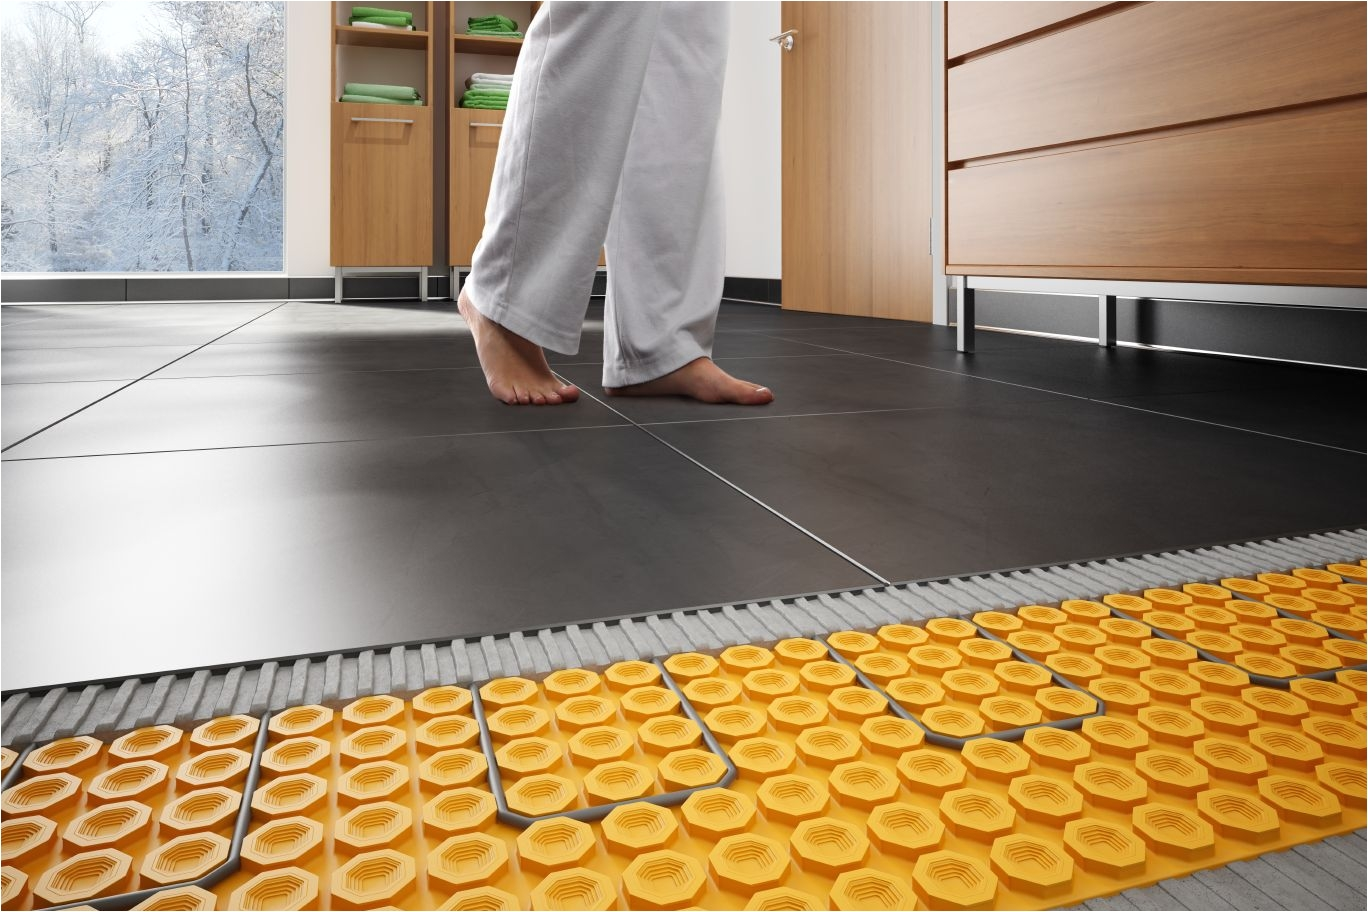 Diy Heated Floor Kit Schlutera Ditra Heat Floor Warming Schluter Com